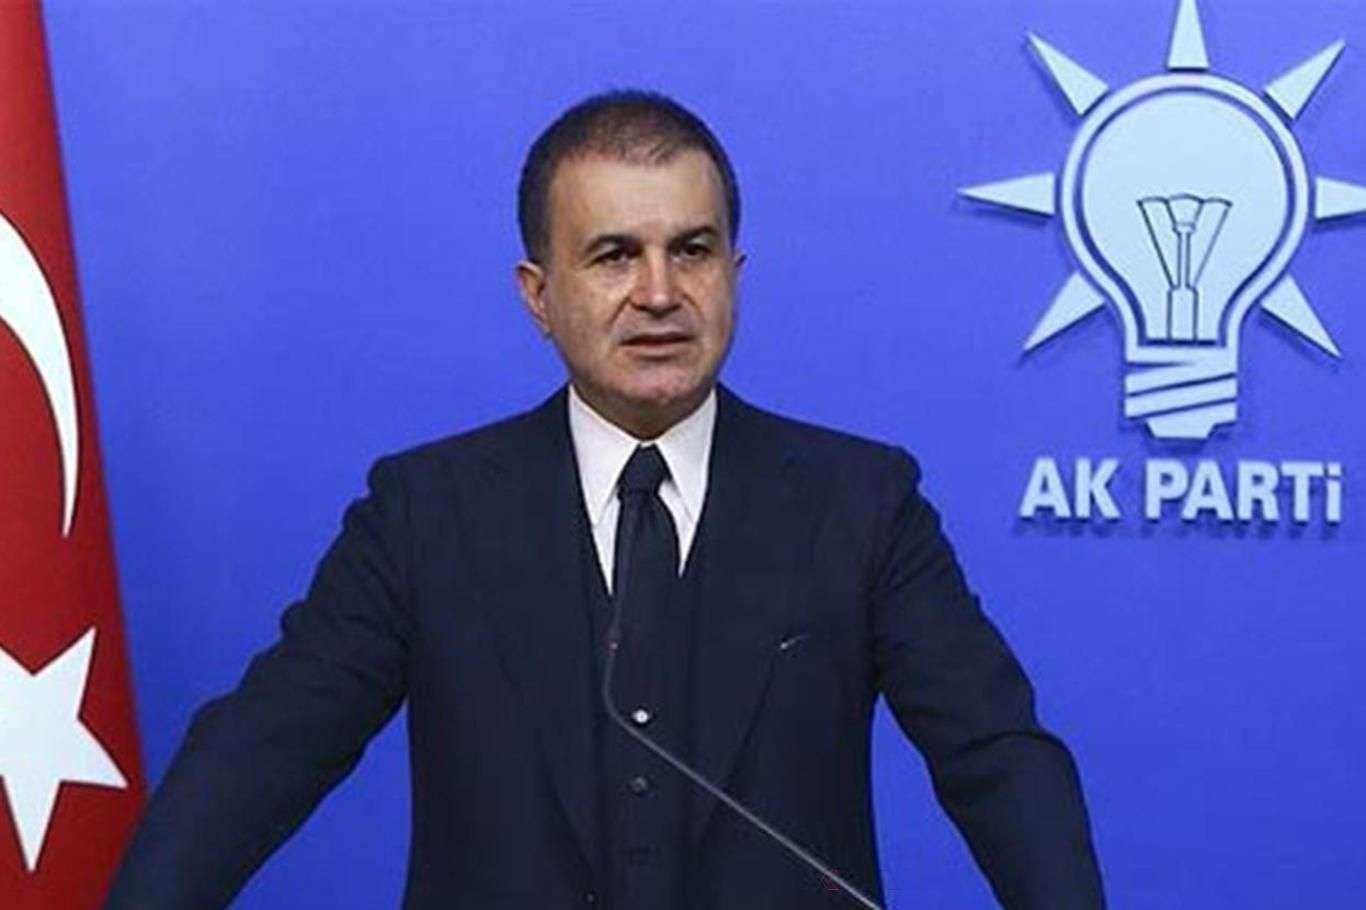 AK Parti Sözcüsü Çelik: Milletine silah doğrultundan daha ahlaksız, daha hain kimse yoktur